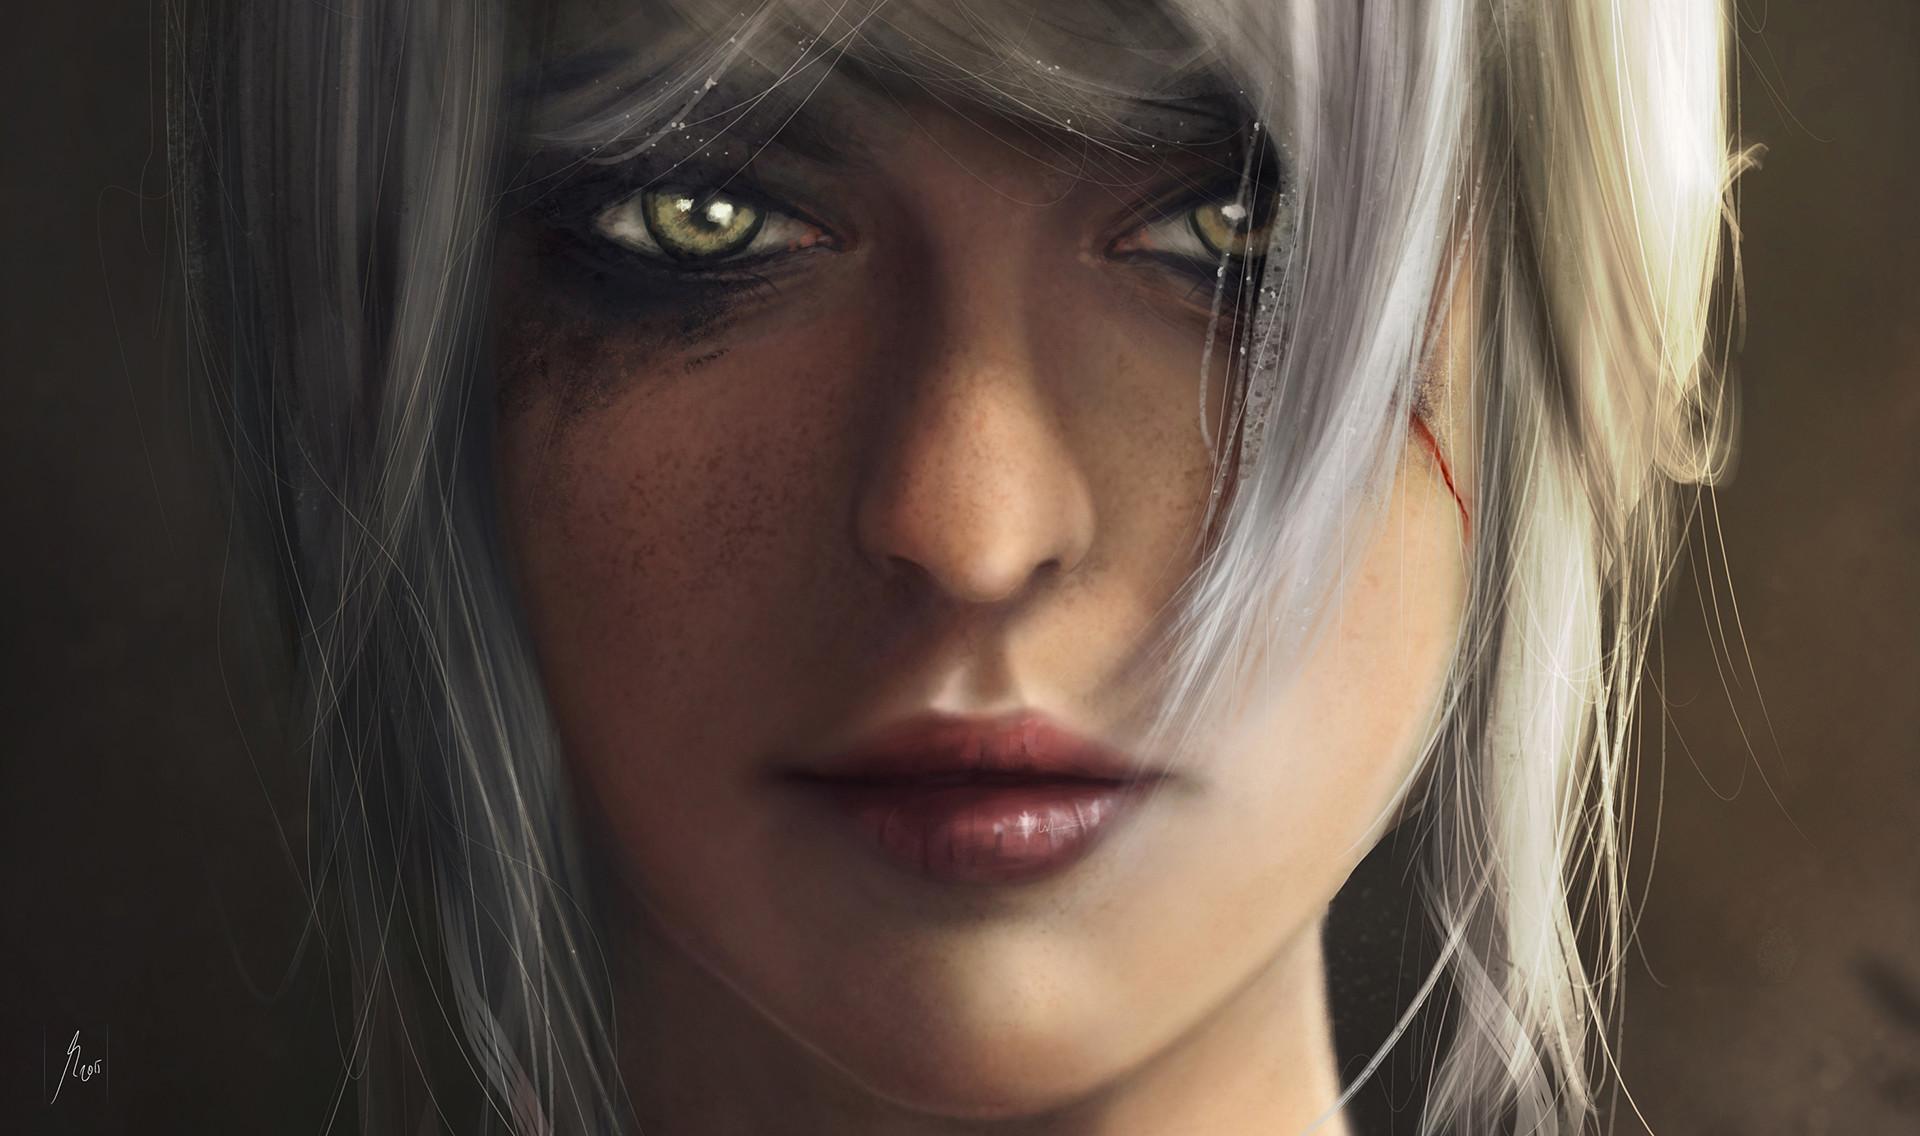 Reha sakar ciri closeup 1080